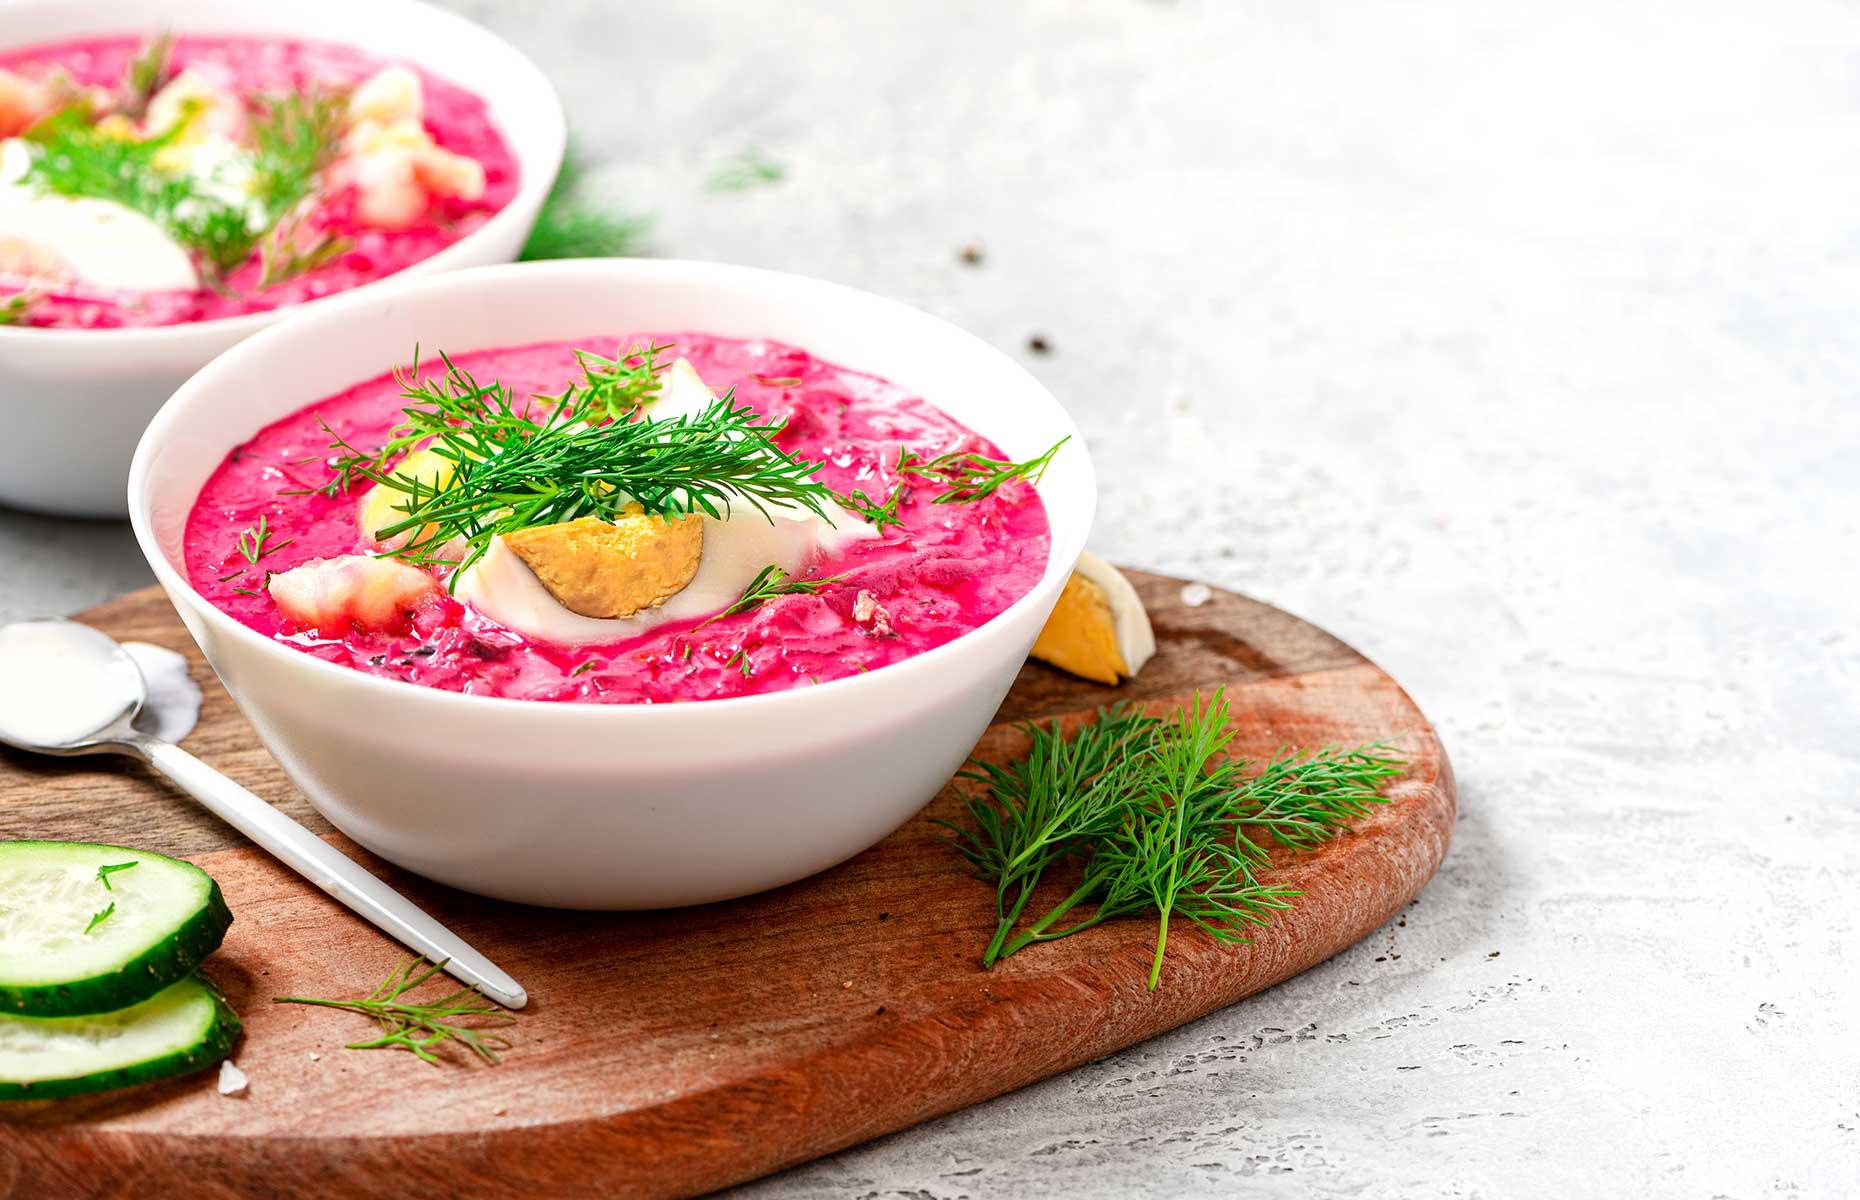 Chilled beetroot soup (Image: Svetlana Monyakova/Shutterstock)